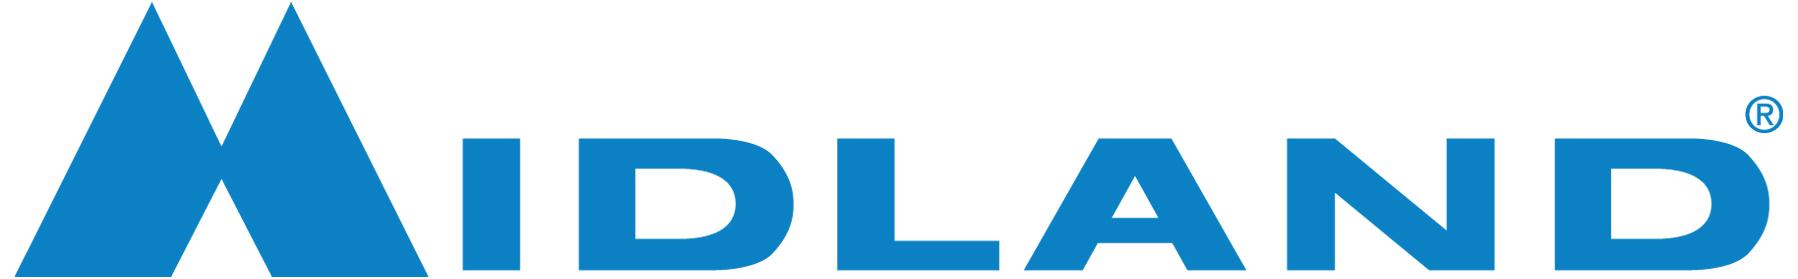 Midland Logo_No Globe_PMS3005